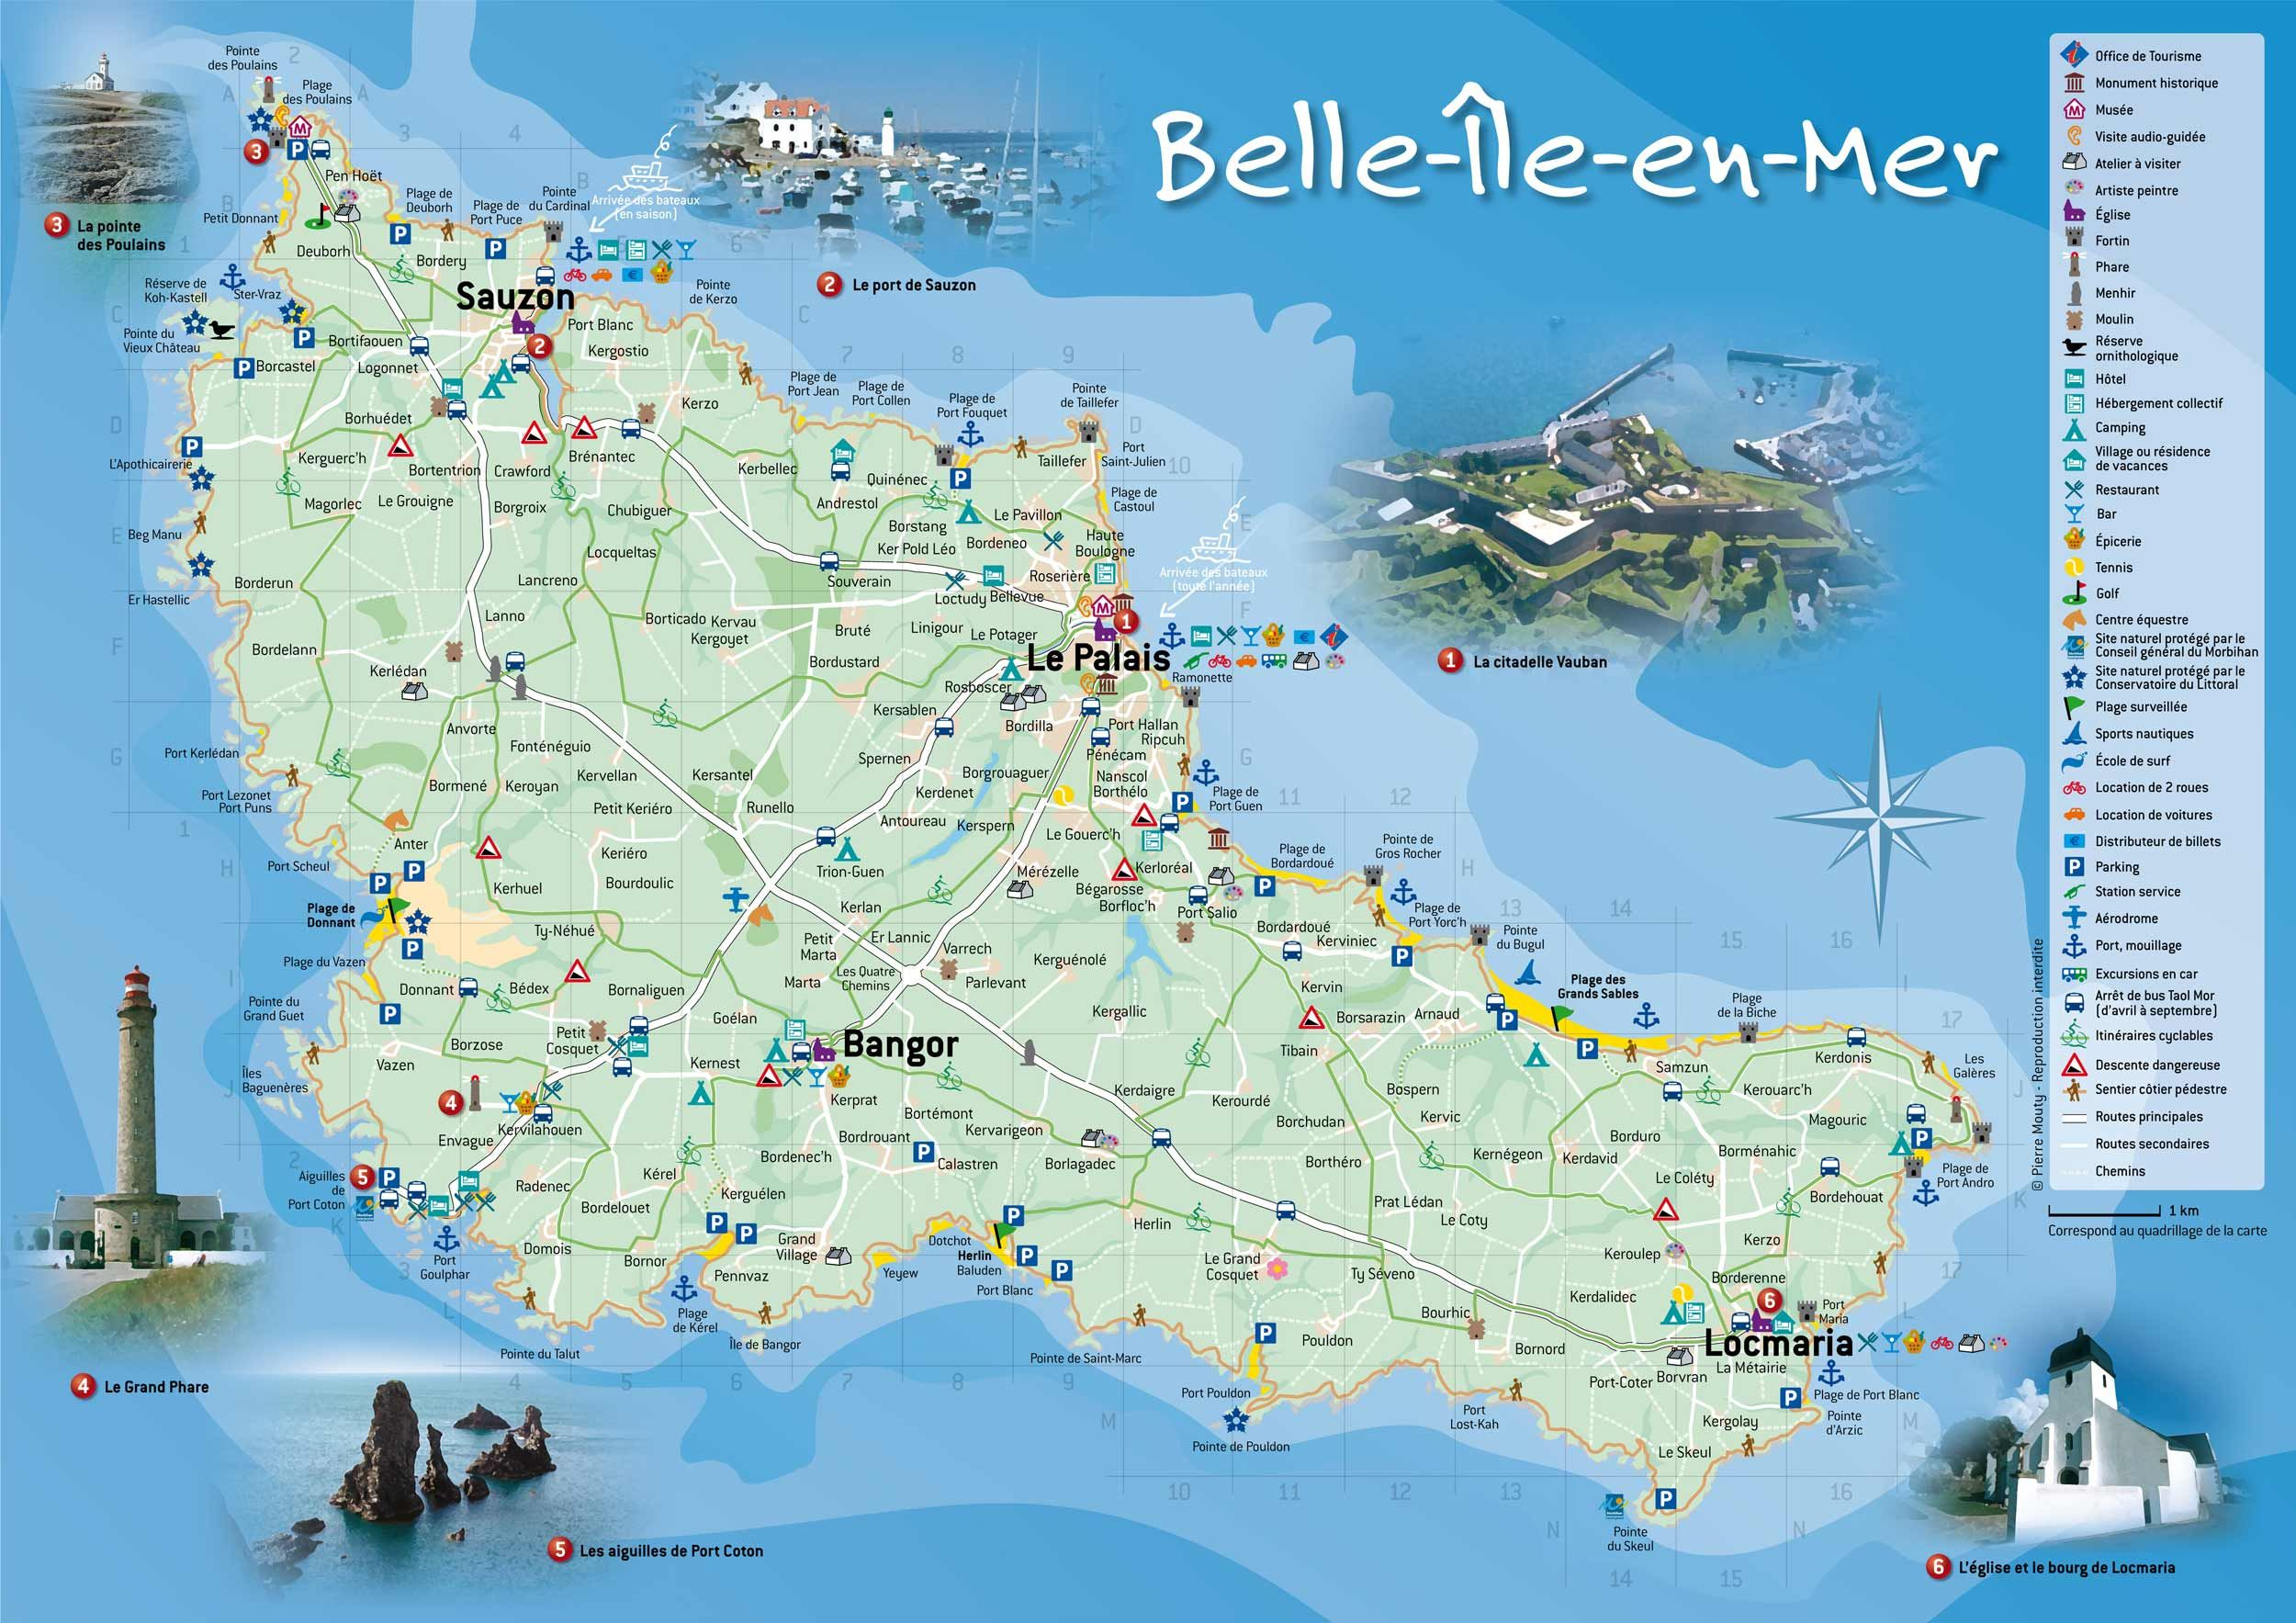 carte de belle ile Carte de l ile Belle ile en mer | Belle ile en mer, Iles du ponant